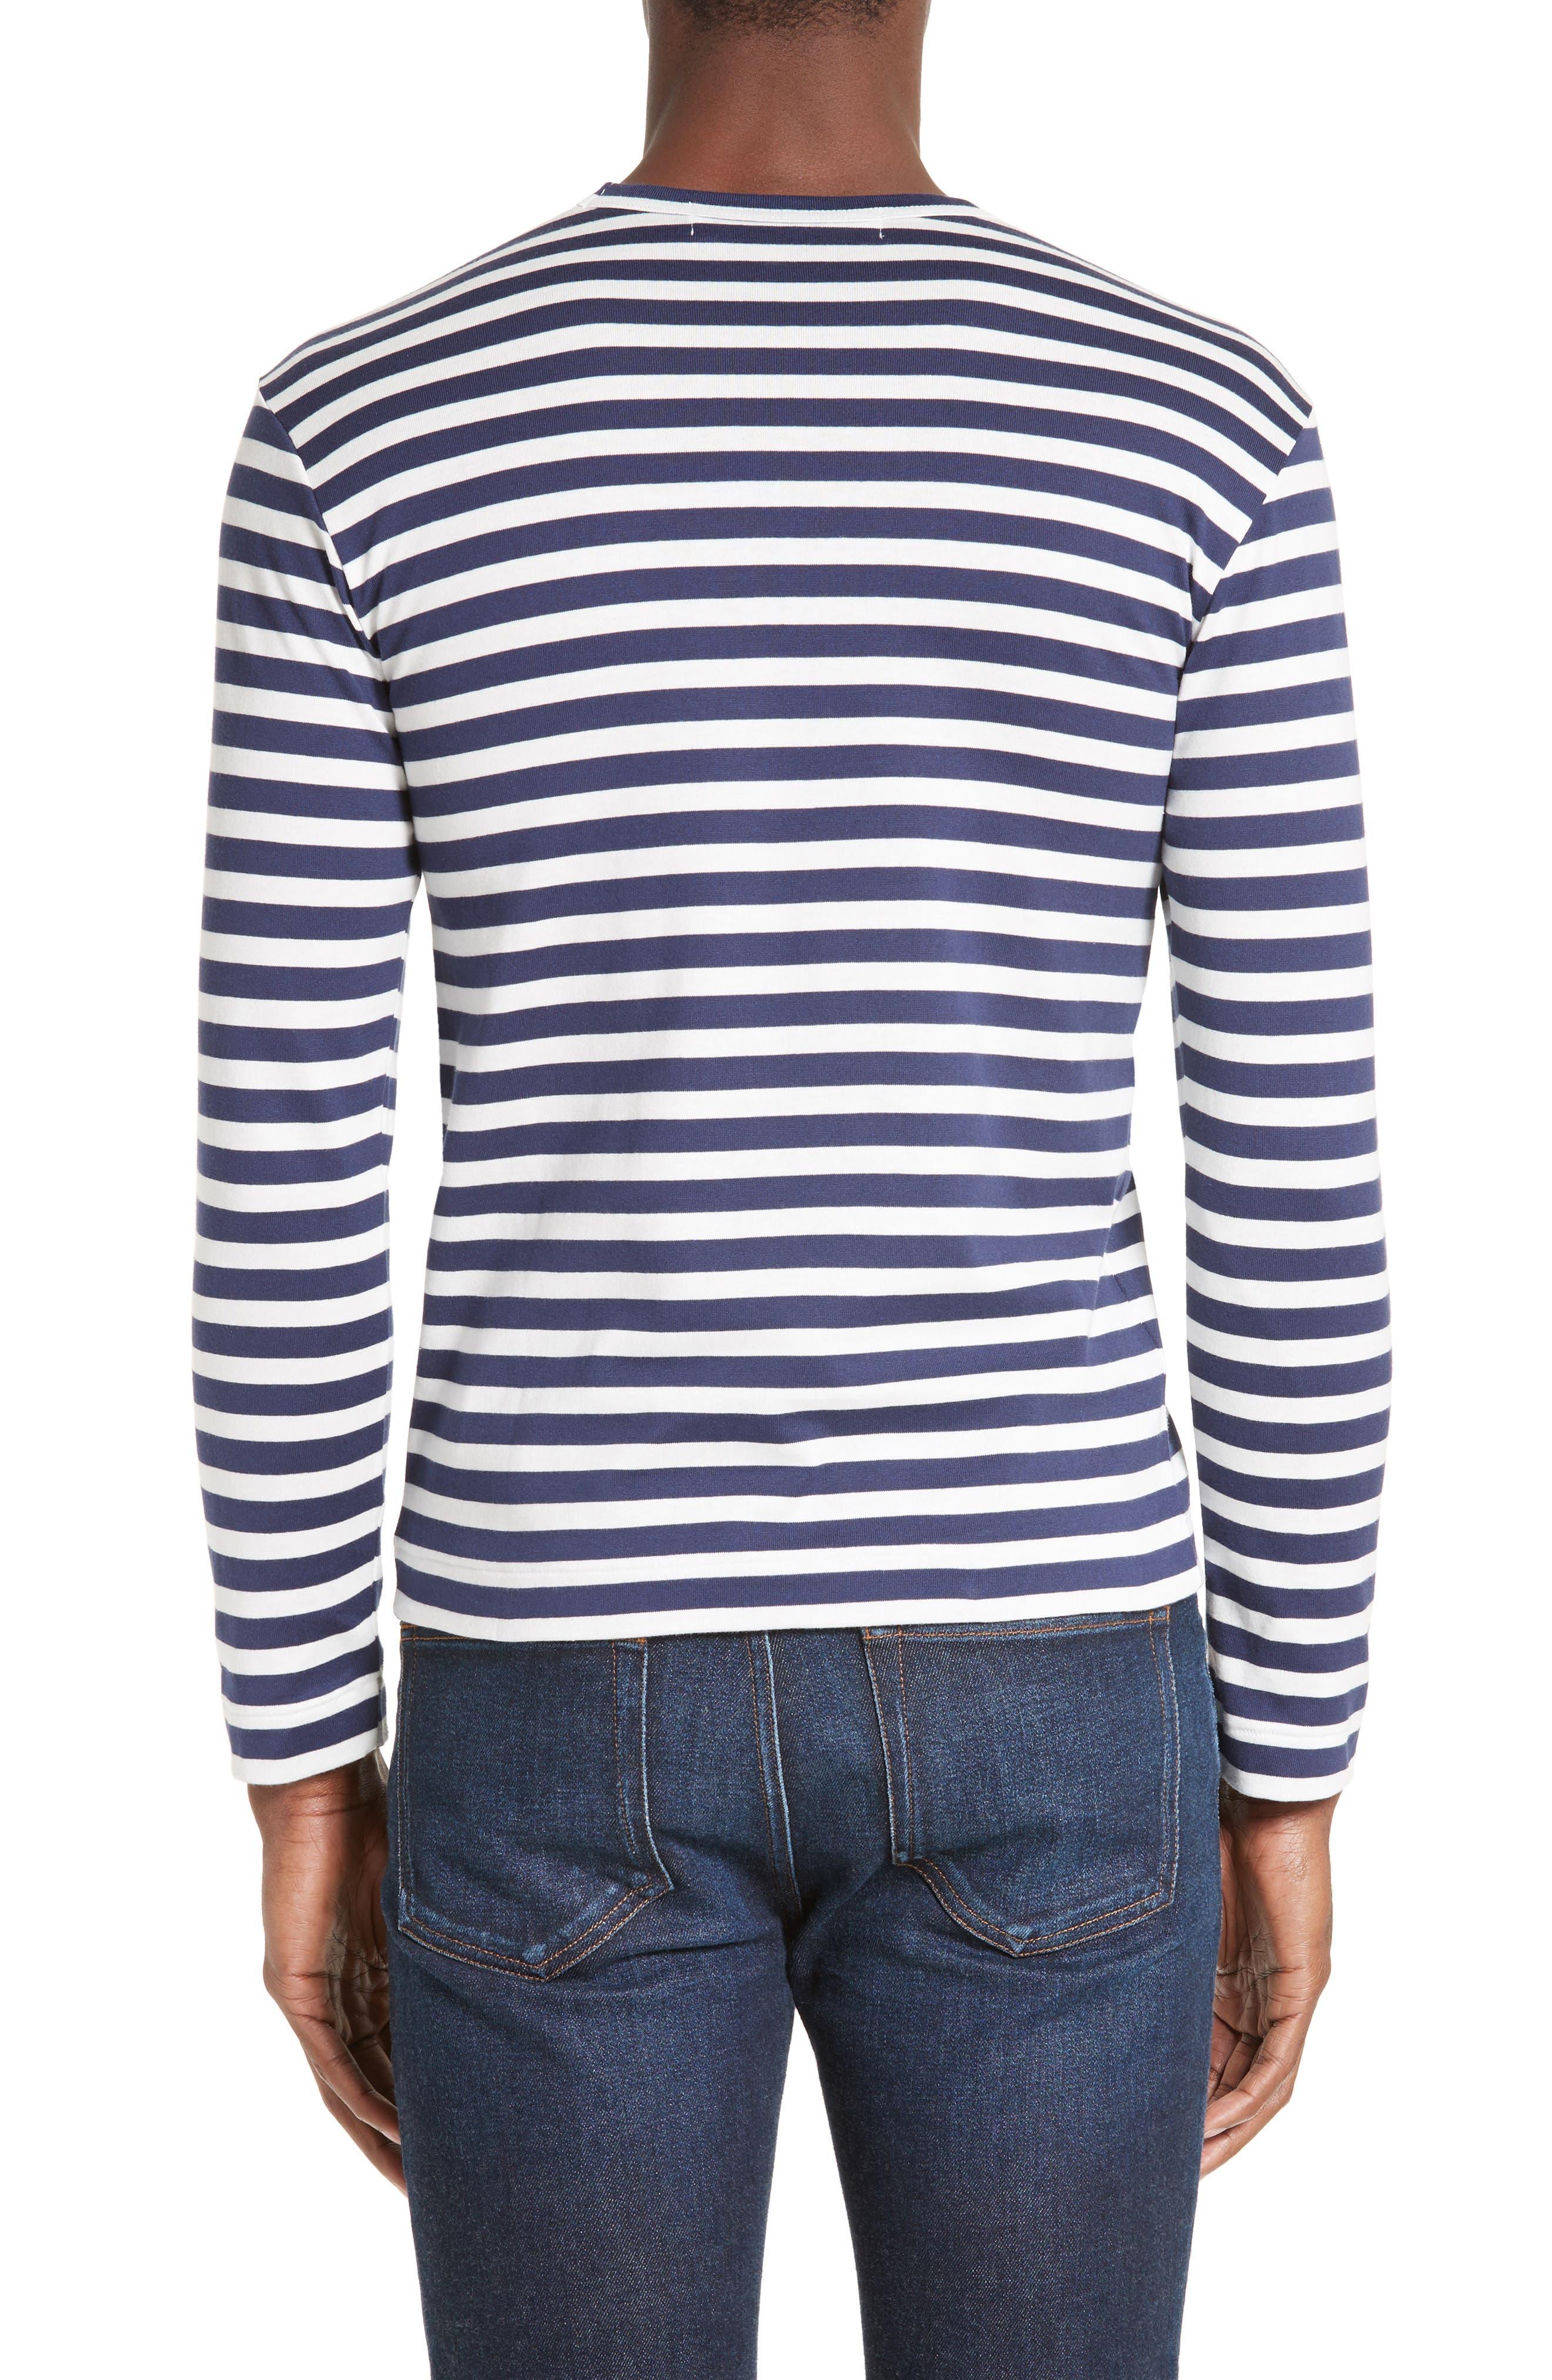 PLAY Stripe T-Shirt,                             Alternate thumbnail 2, color,